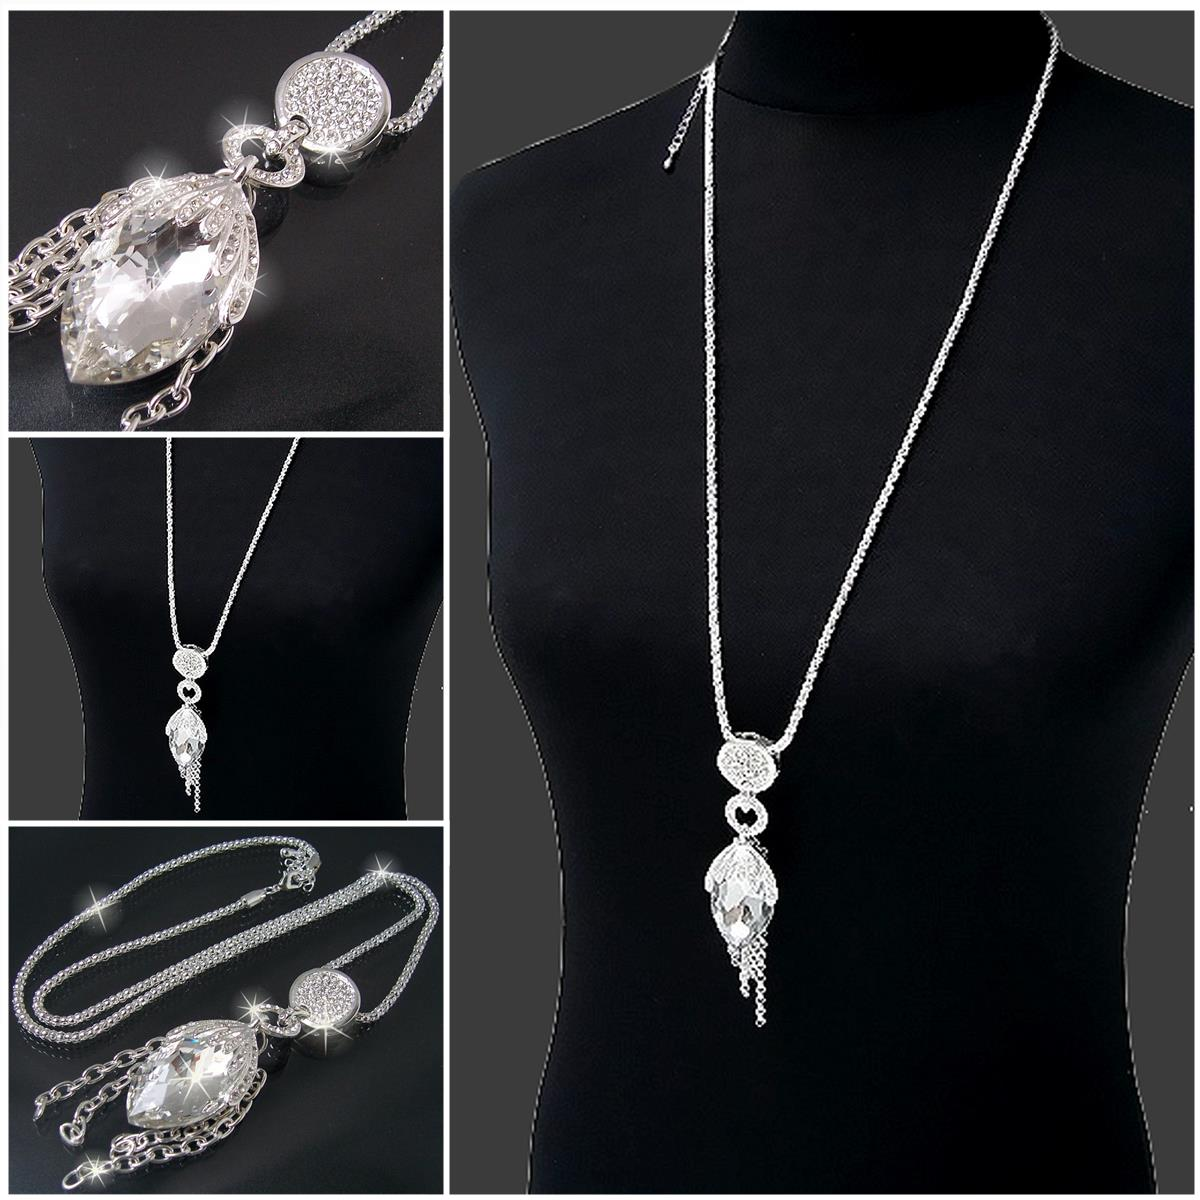 Modeschmuck gold kette  Lange Halskette Kette Silber Gold mit Anhänger Strass Zirkonia ...